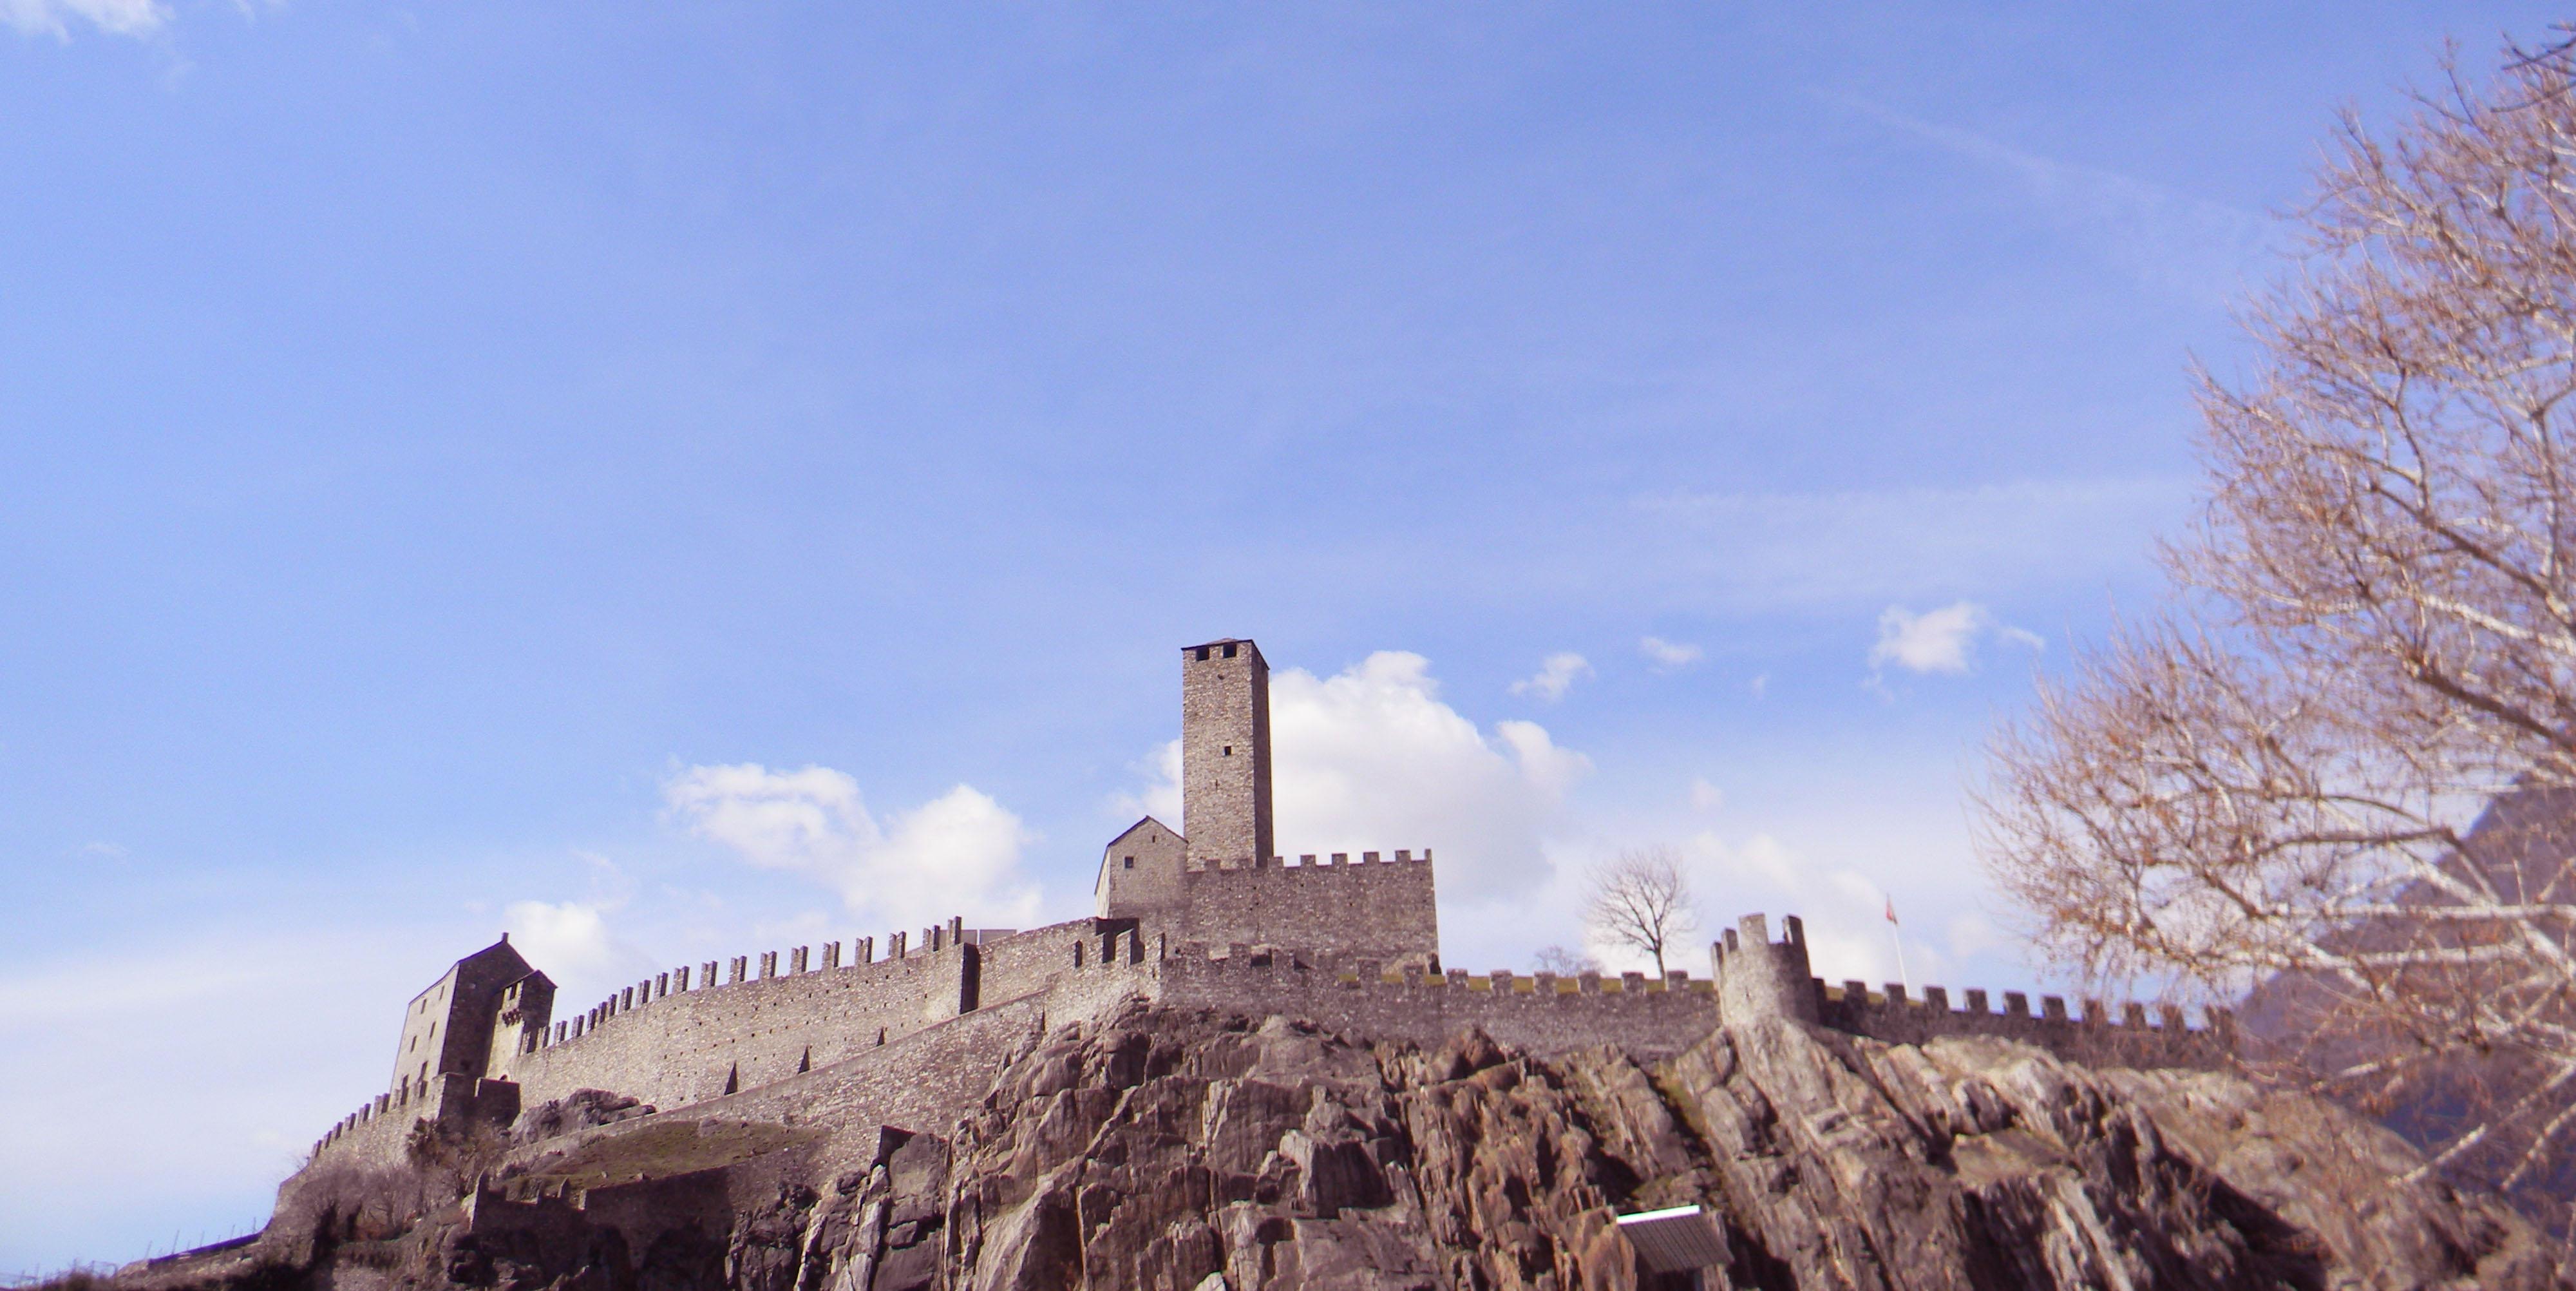 Castelgrande, Bellinzona